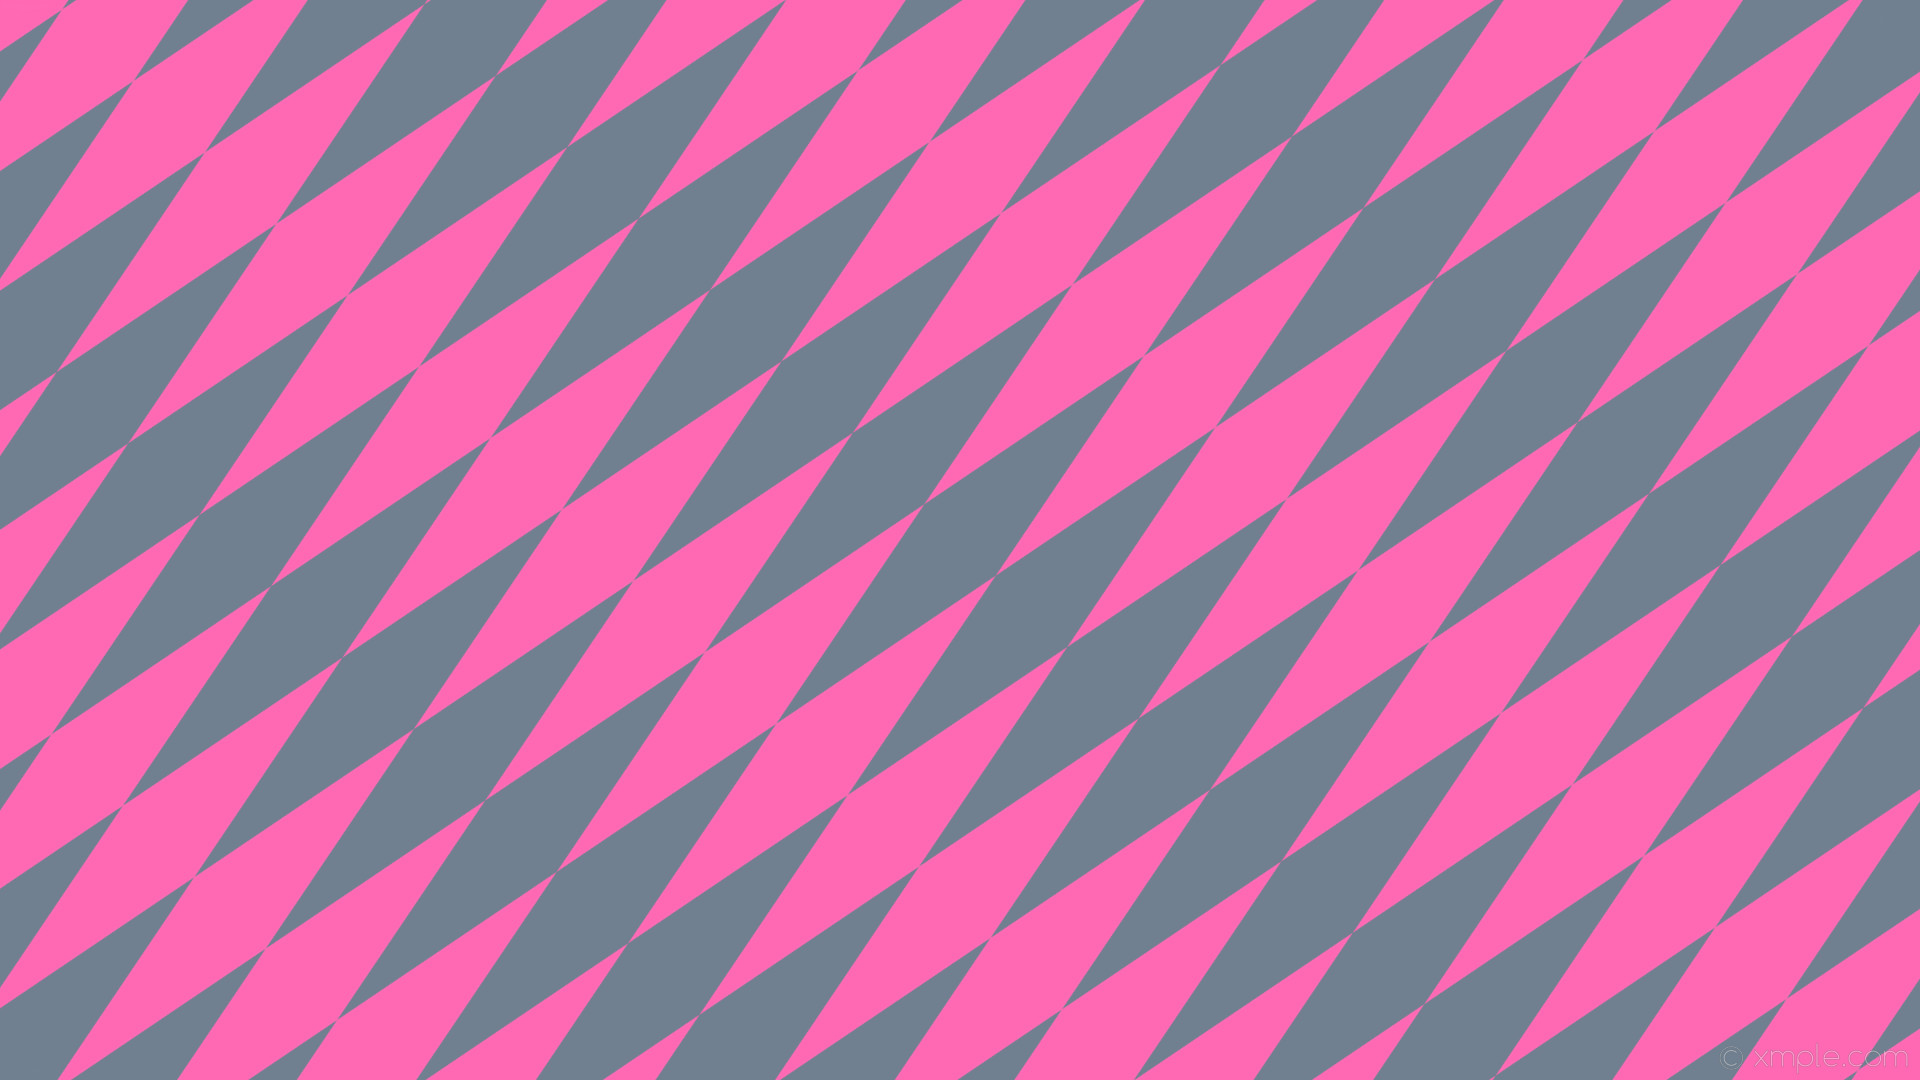 wallpaper rhombus lozenge pink diamond grey slate gray hot pink #708090  #ff69b4 45°